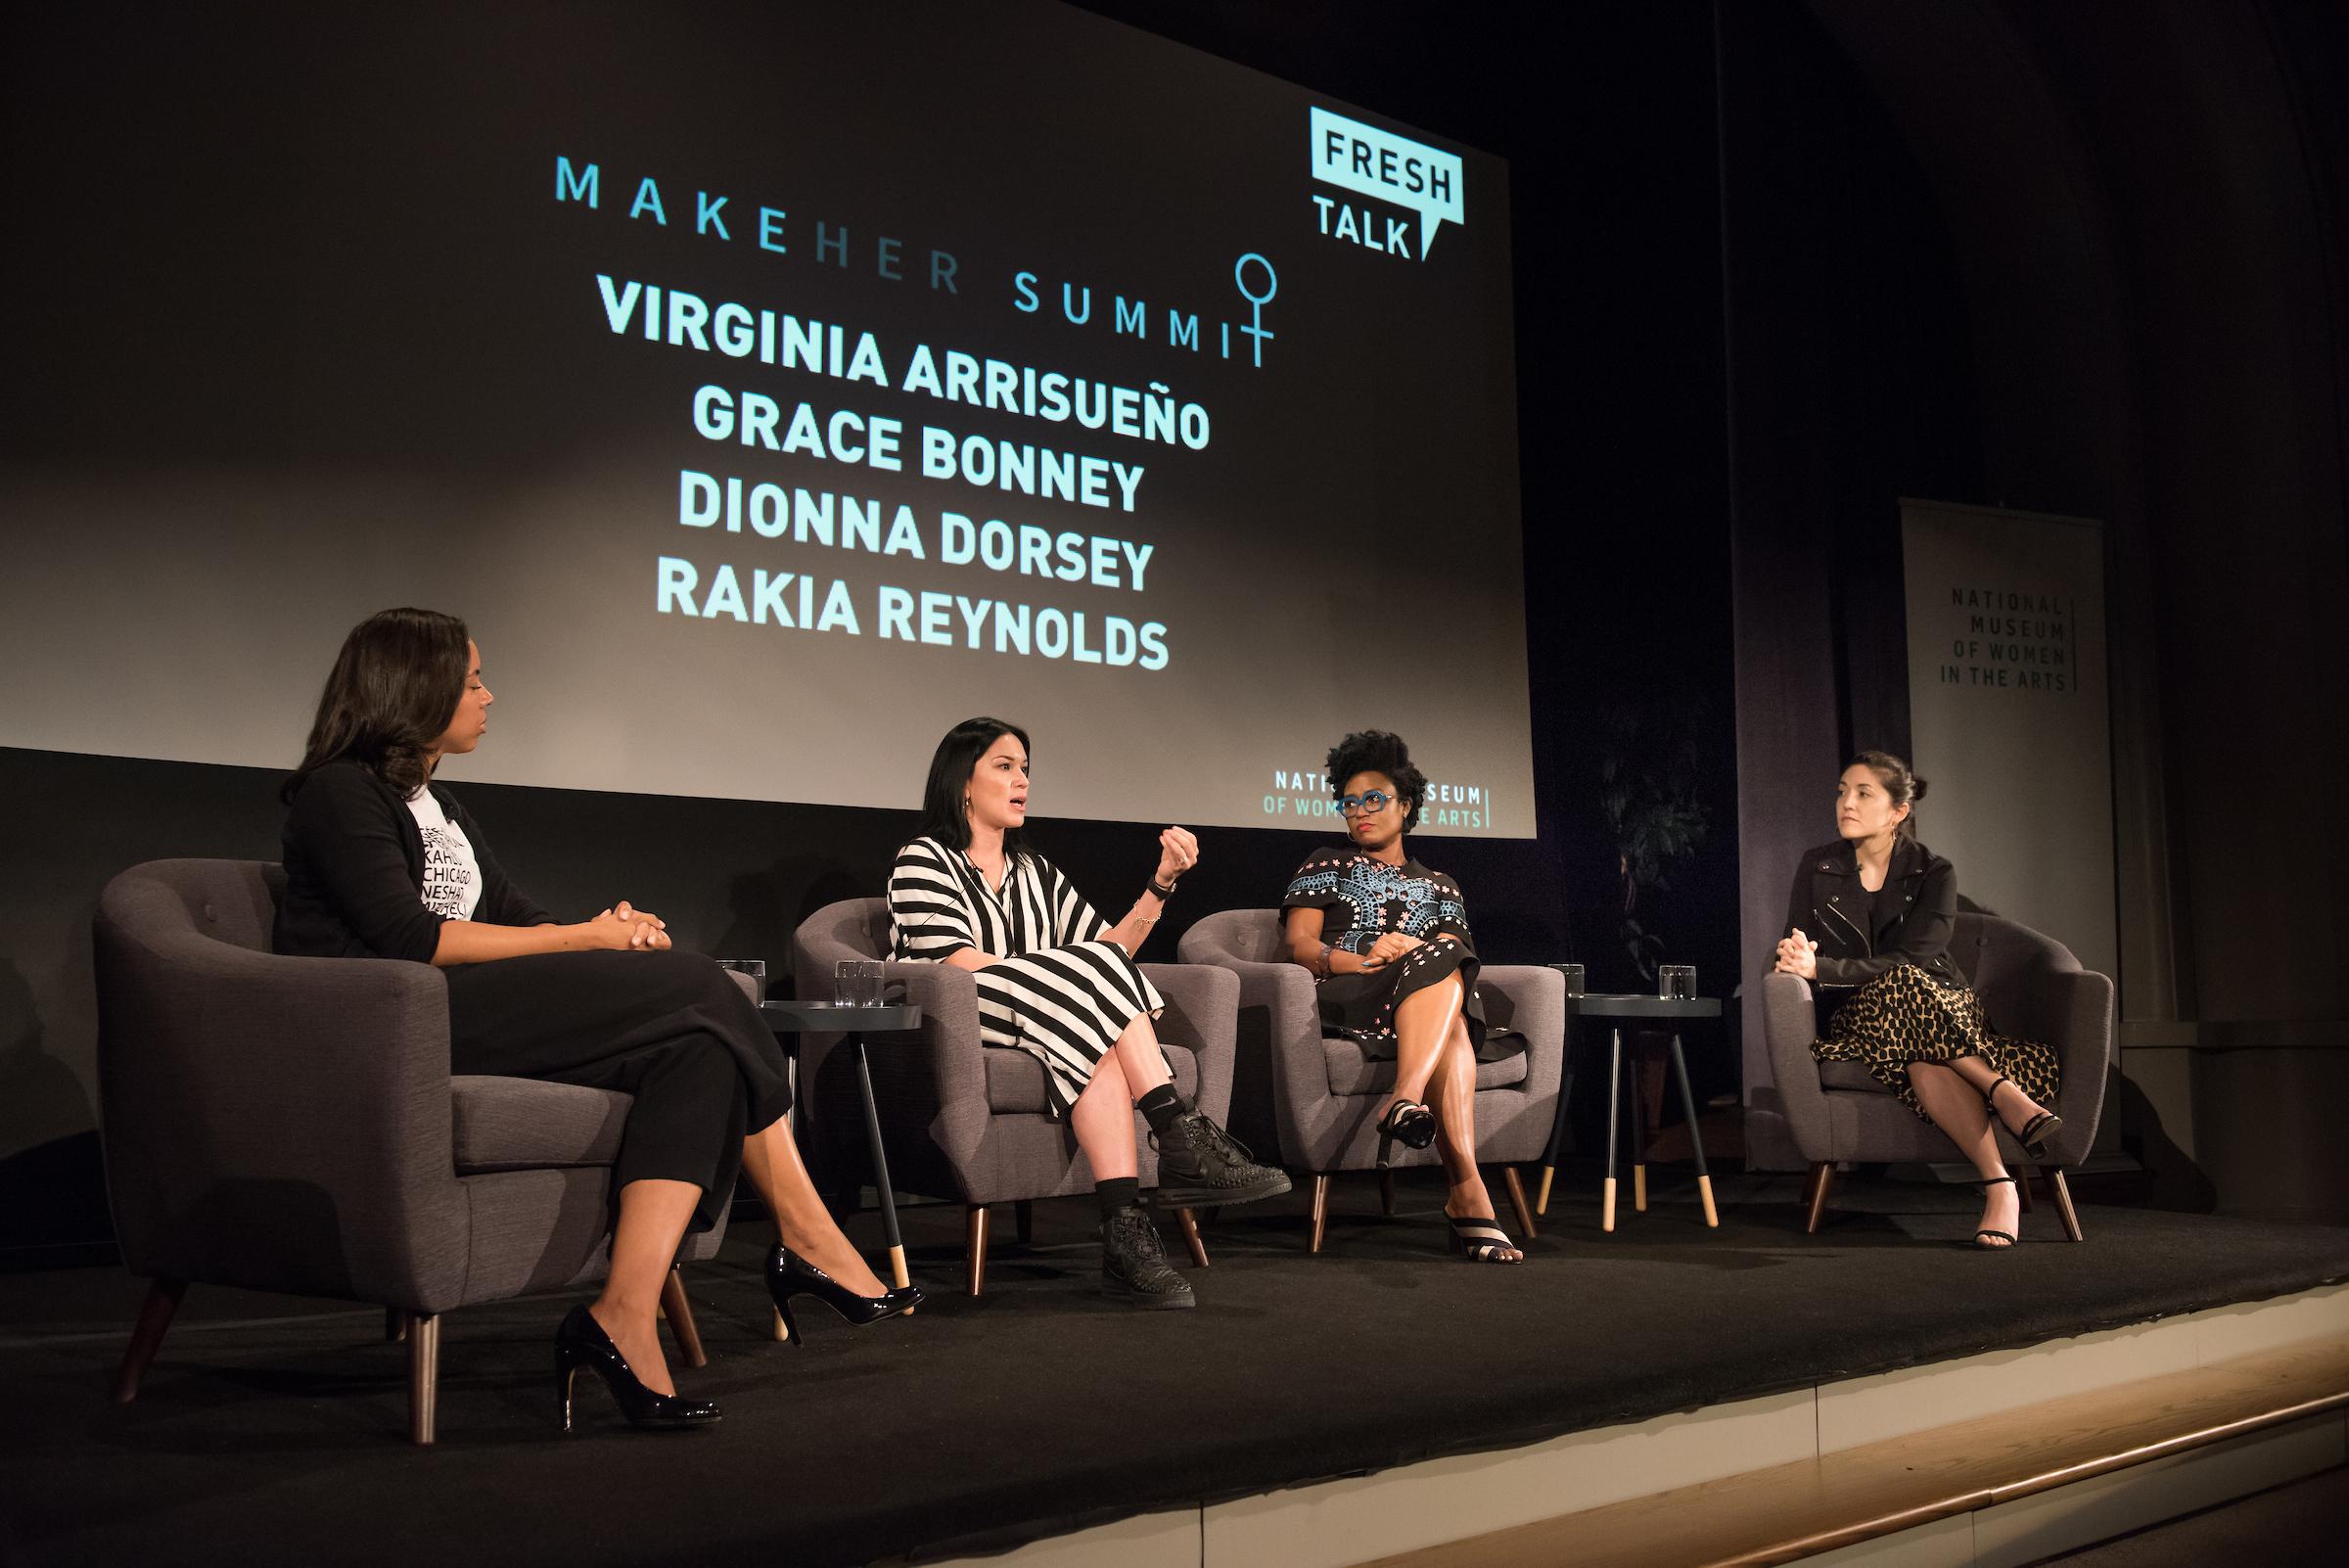 Dionna Dorsey, Virginia Blanca Arrisueño, Rakia Reynolds, and Grace Bonney.